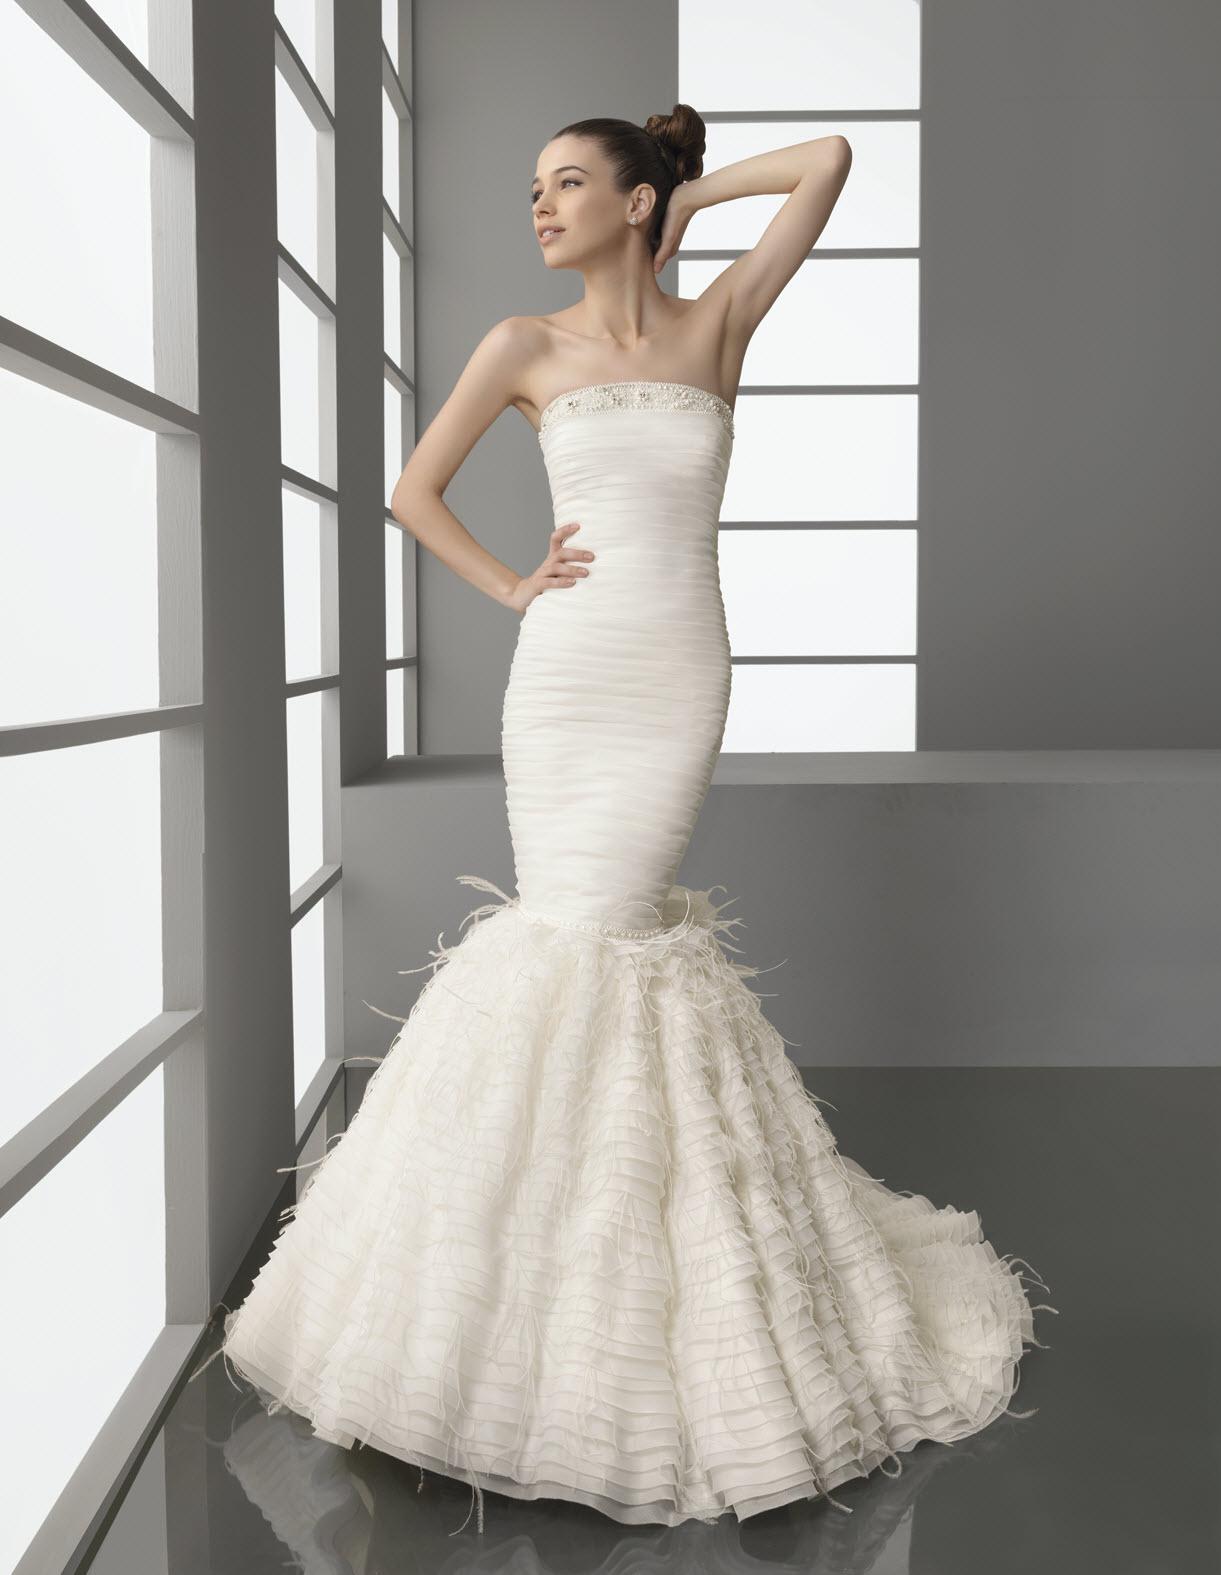 Trumpet Bottom Wedding Dresses : Mermaid wedding dress with feather adorned trumpet skirt onewed